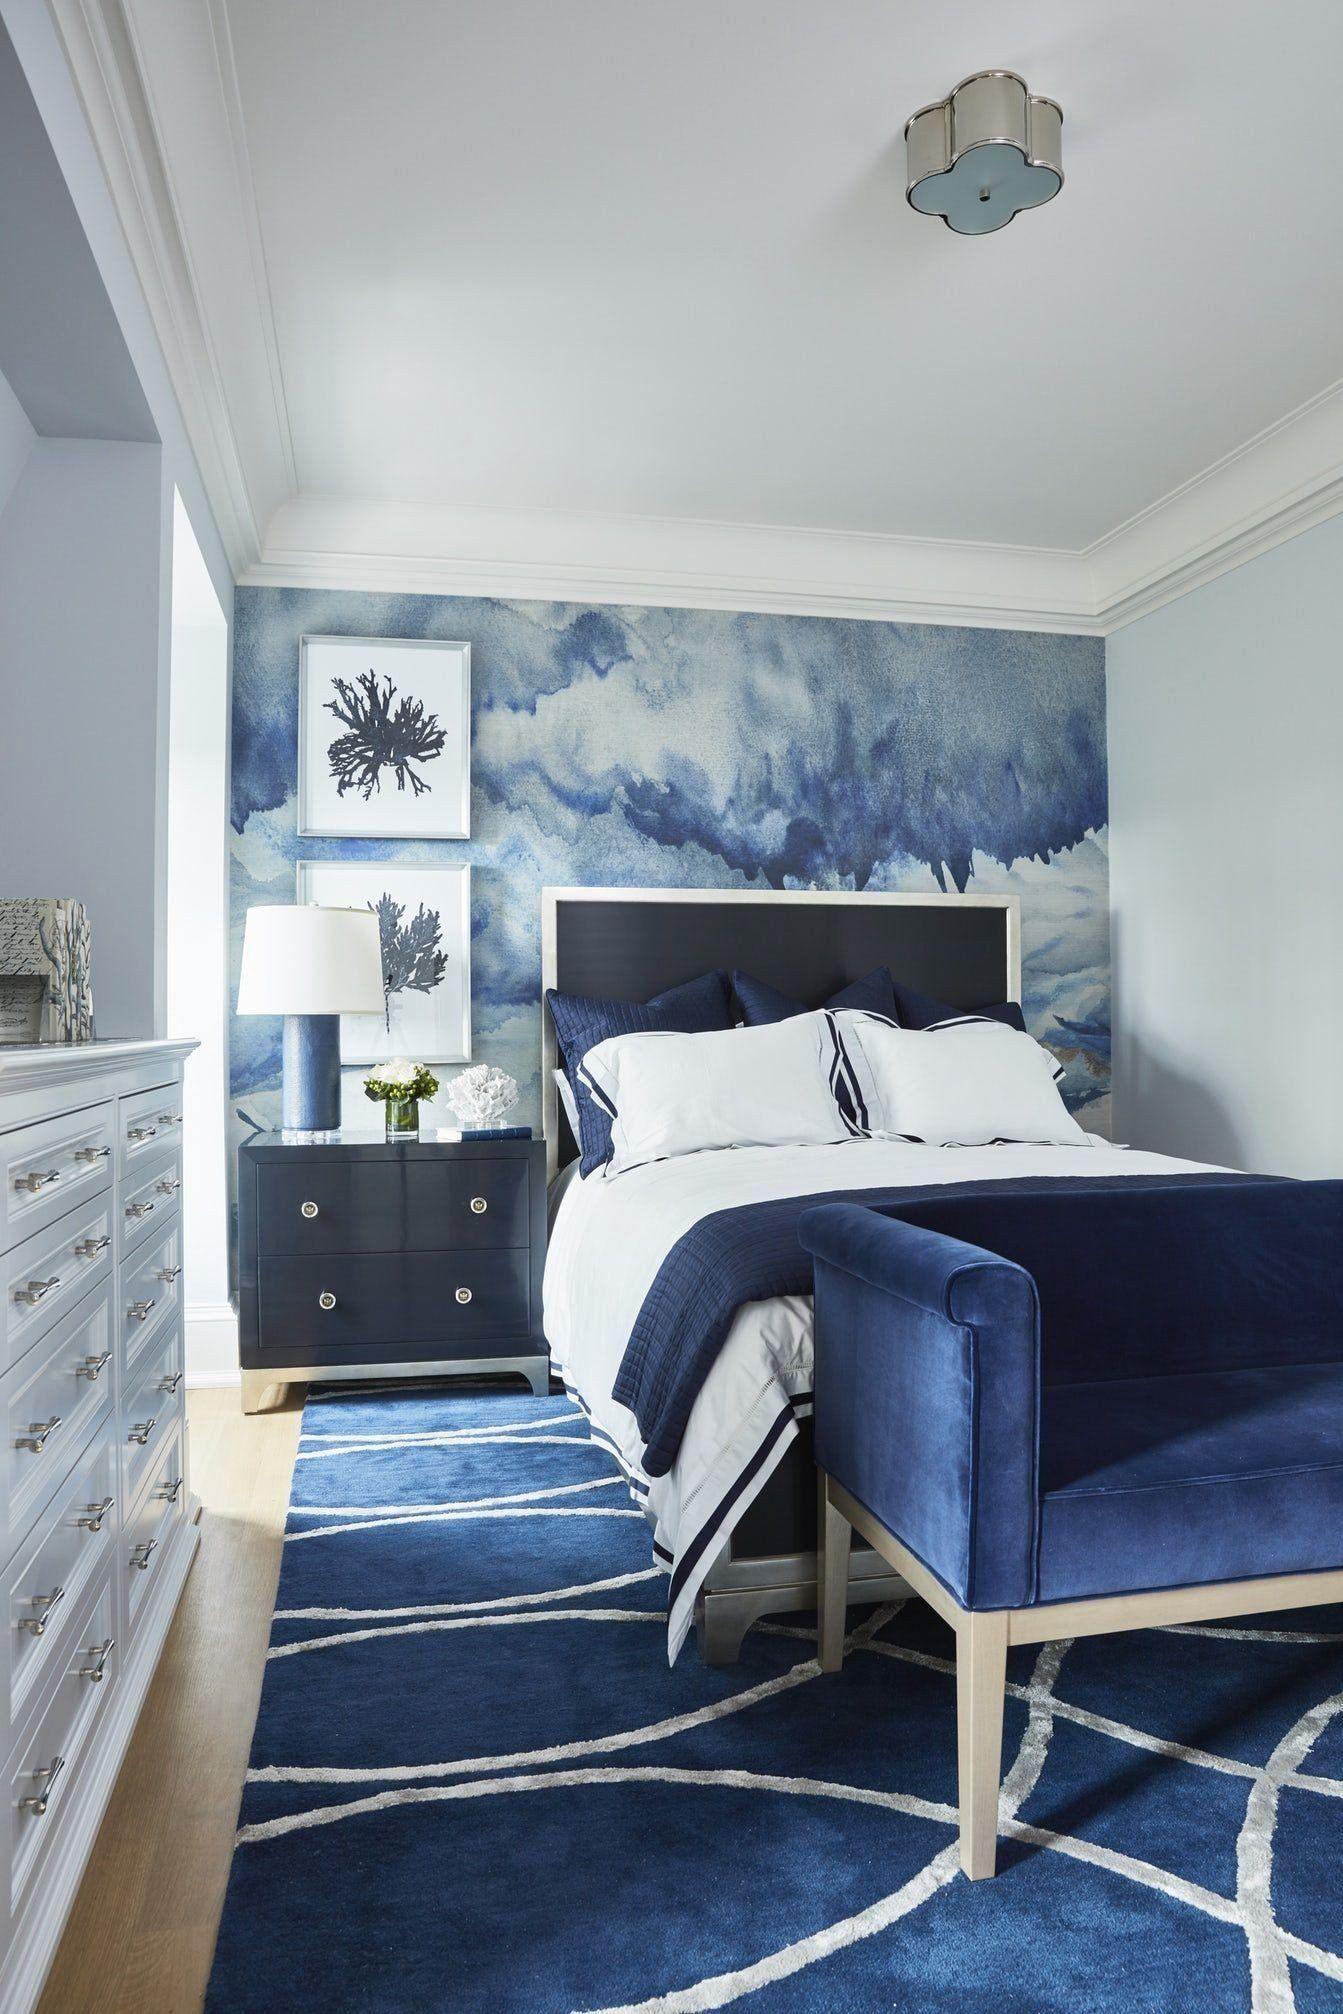 Wallpaper Accent Wall Bedroom Blue . Wallpaper Accent Wall